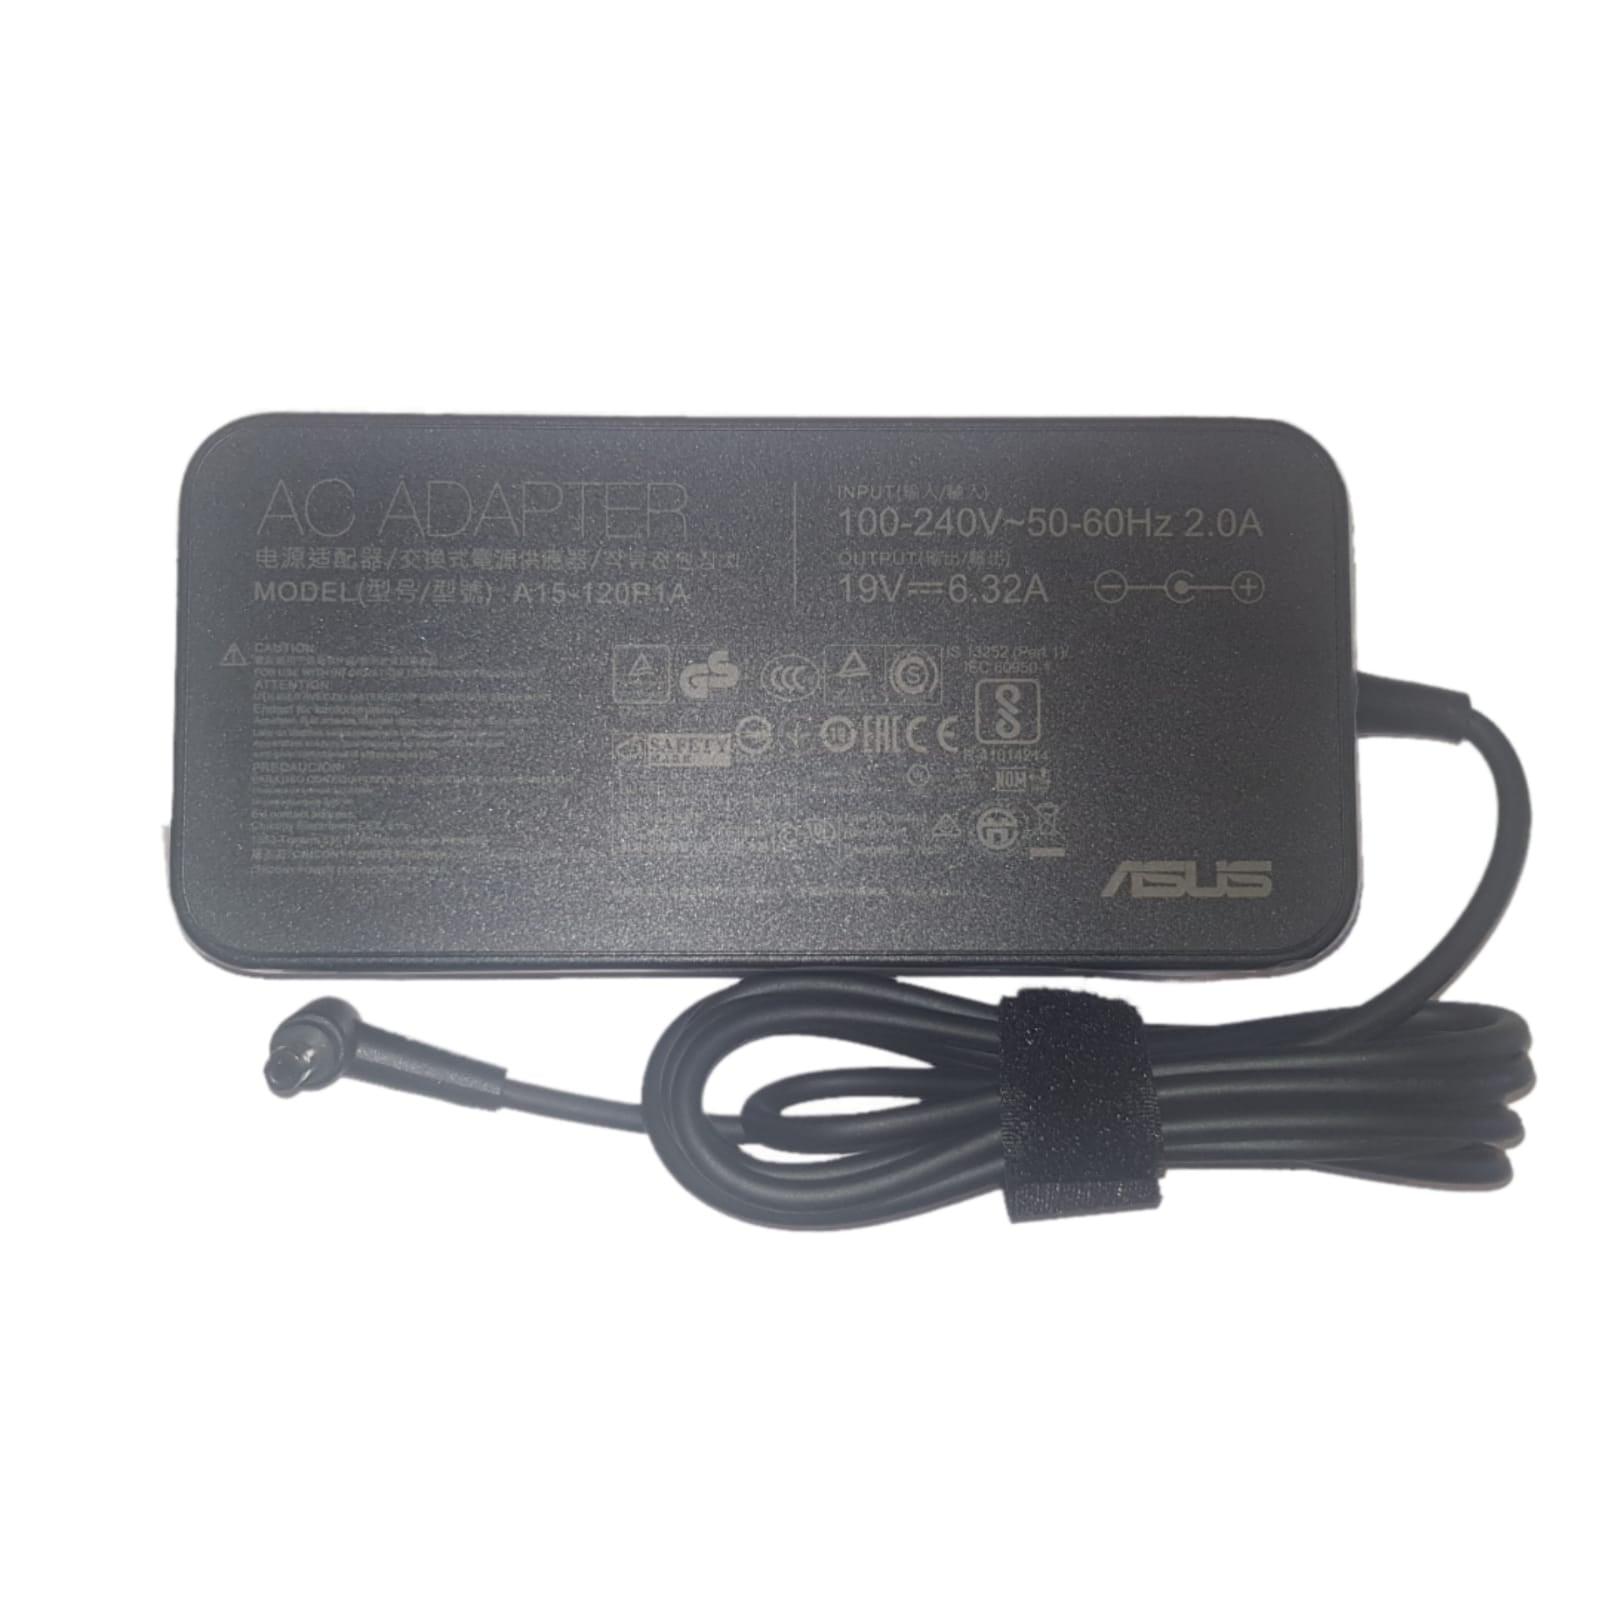 מטען למחשב נייד אסוס Asus N750JK